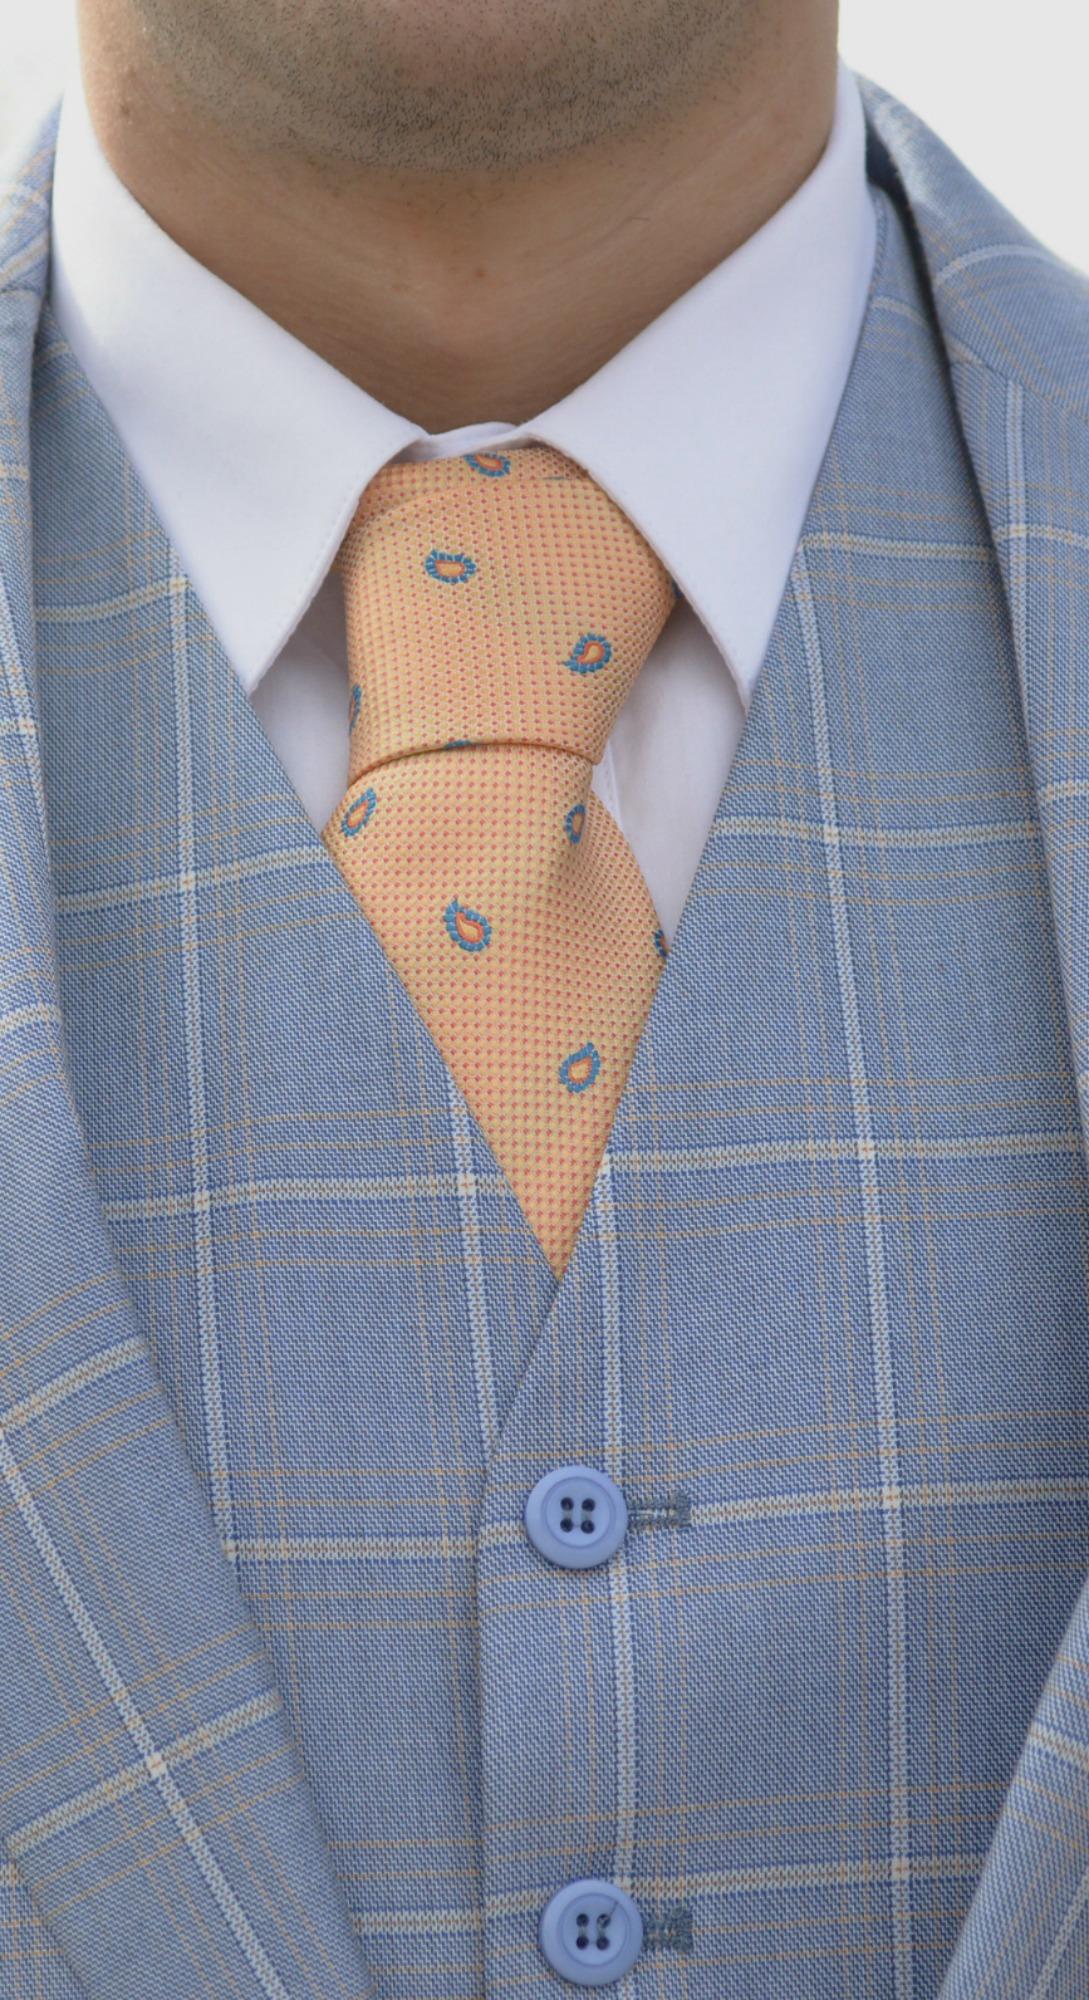 Light Blue Suit and Peach Tie